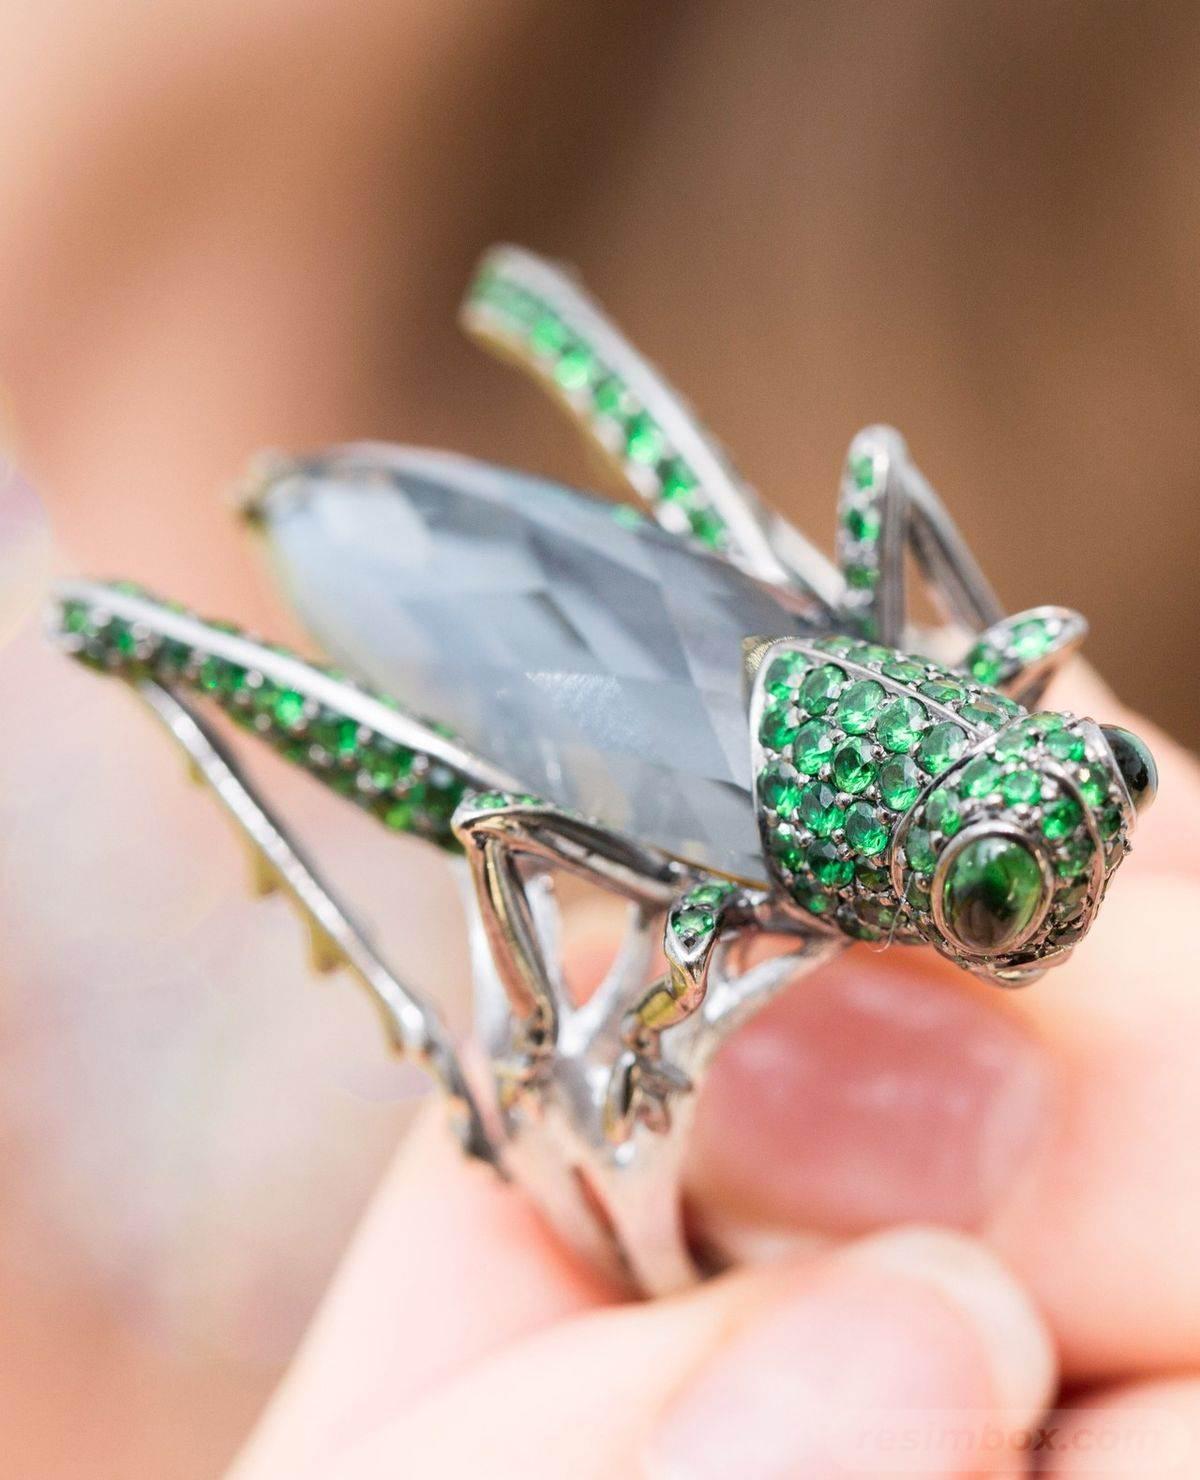 gemologue-animal-jewelry-curation-141652350766416198